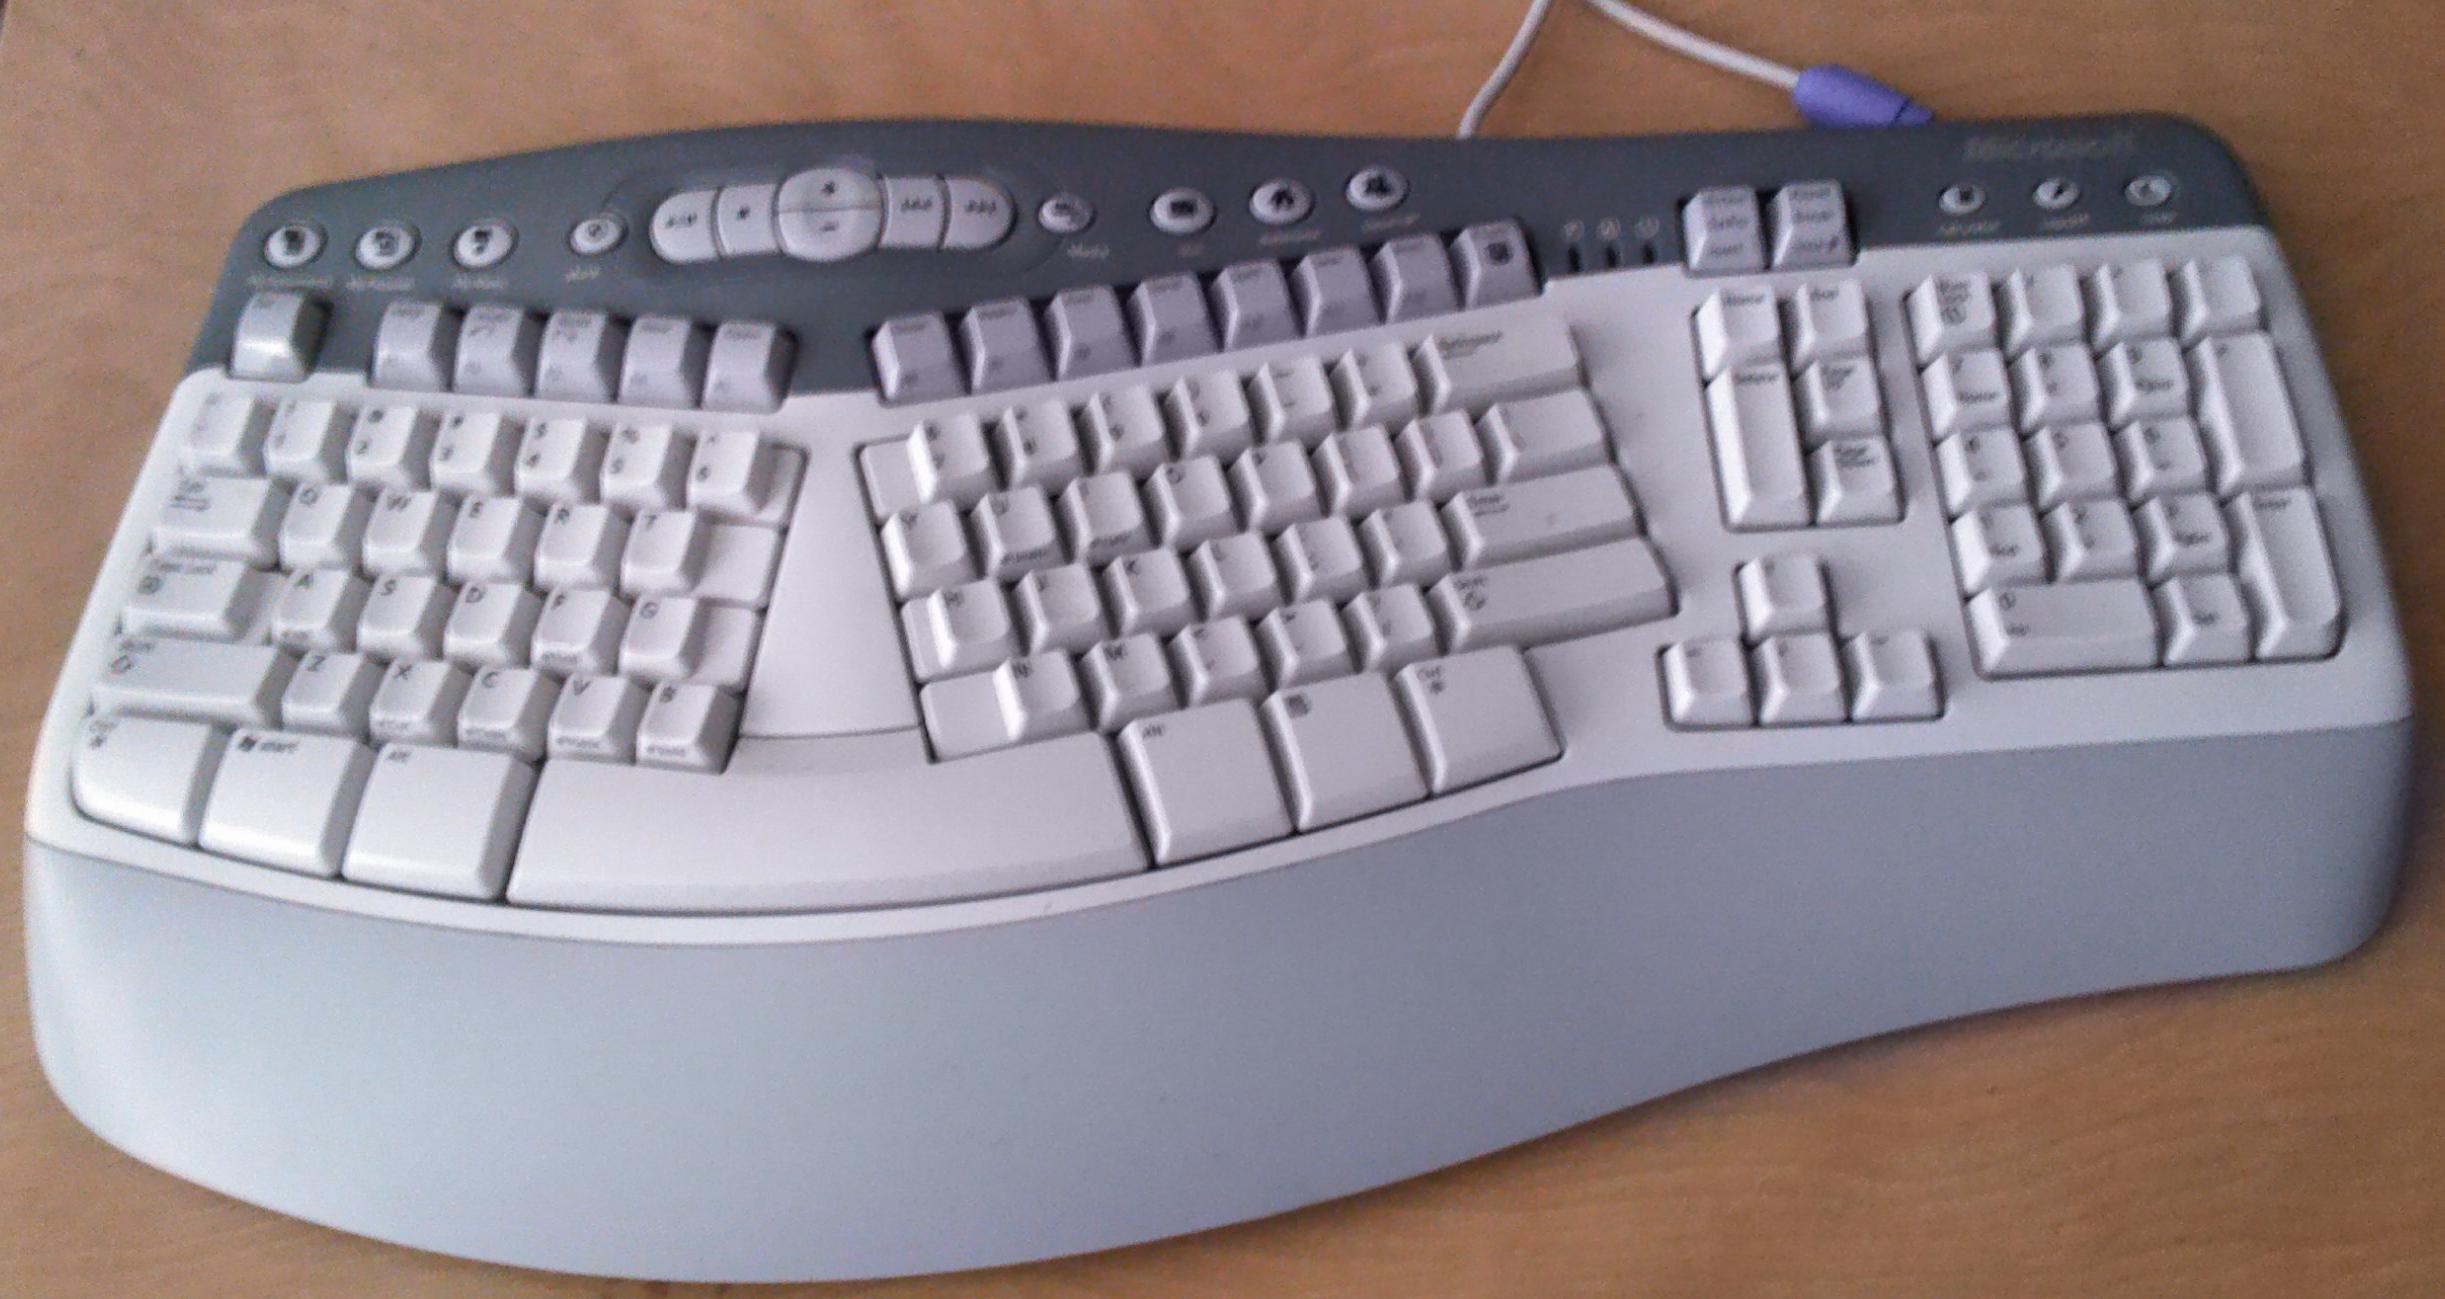 Ms Natural Ergonomic Keyboard  Review